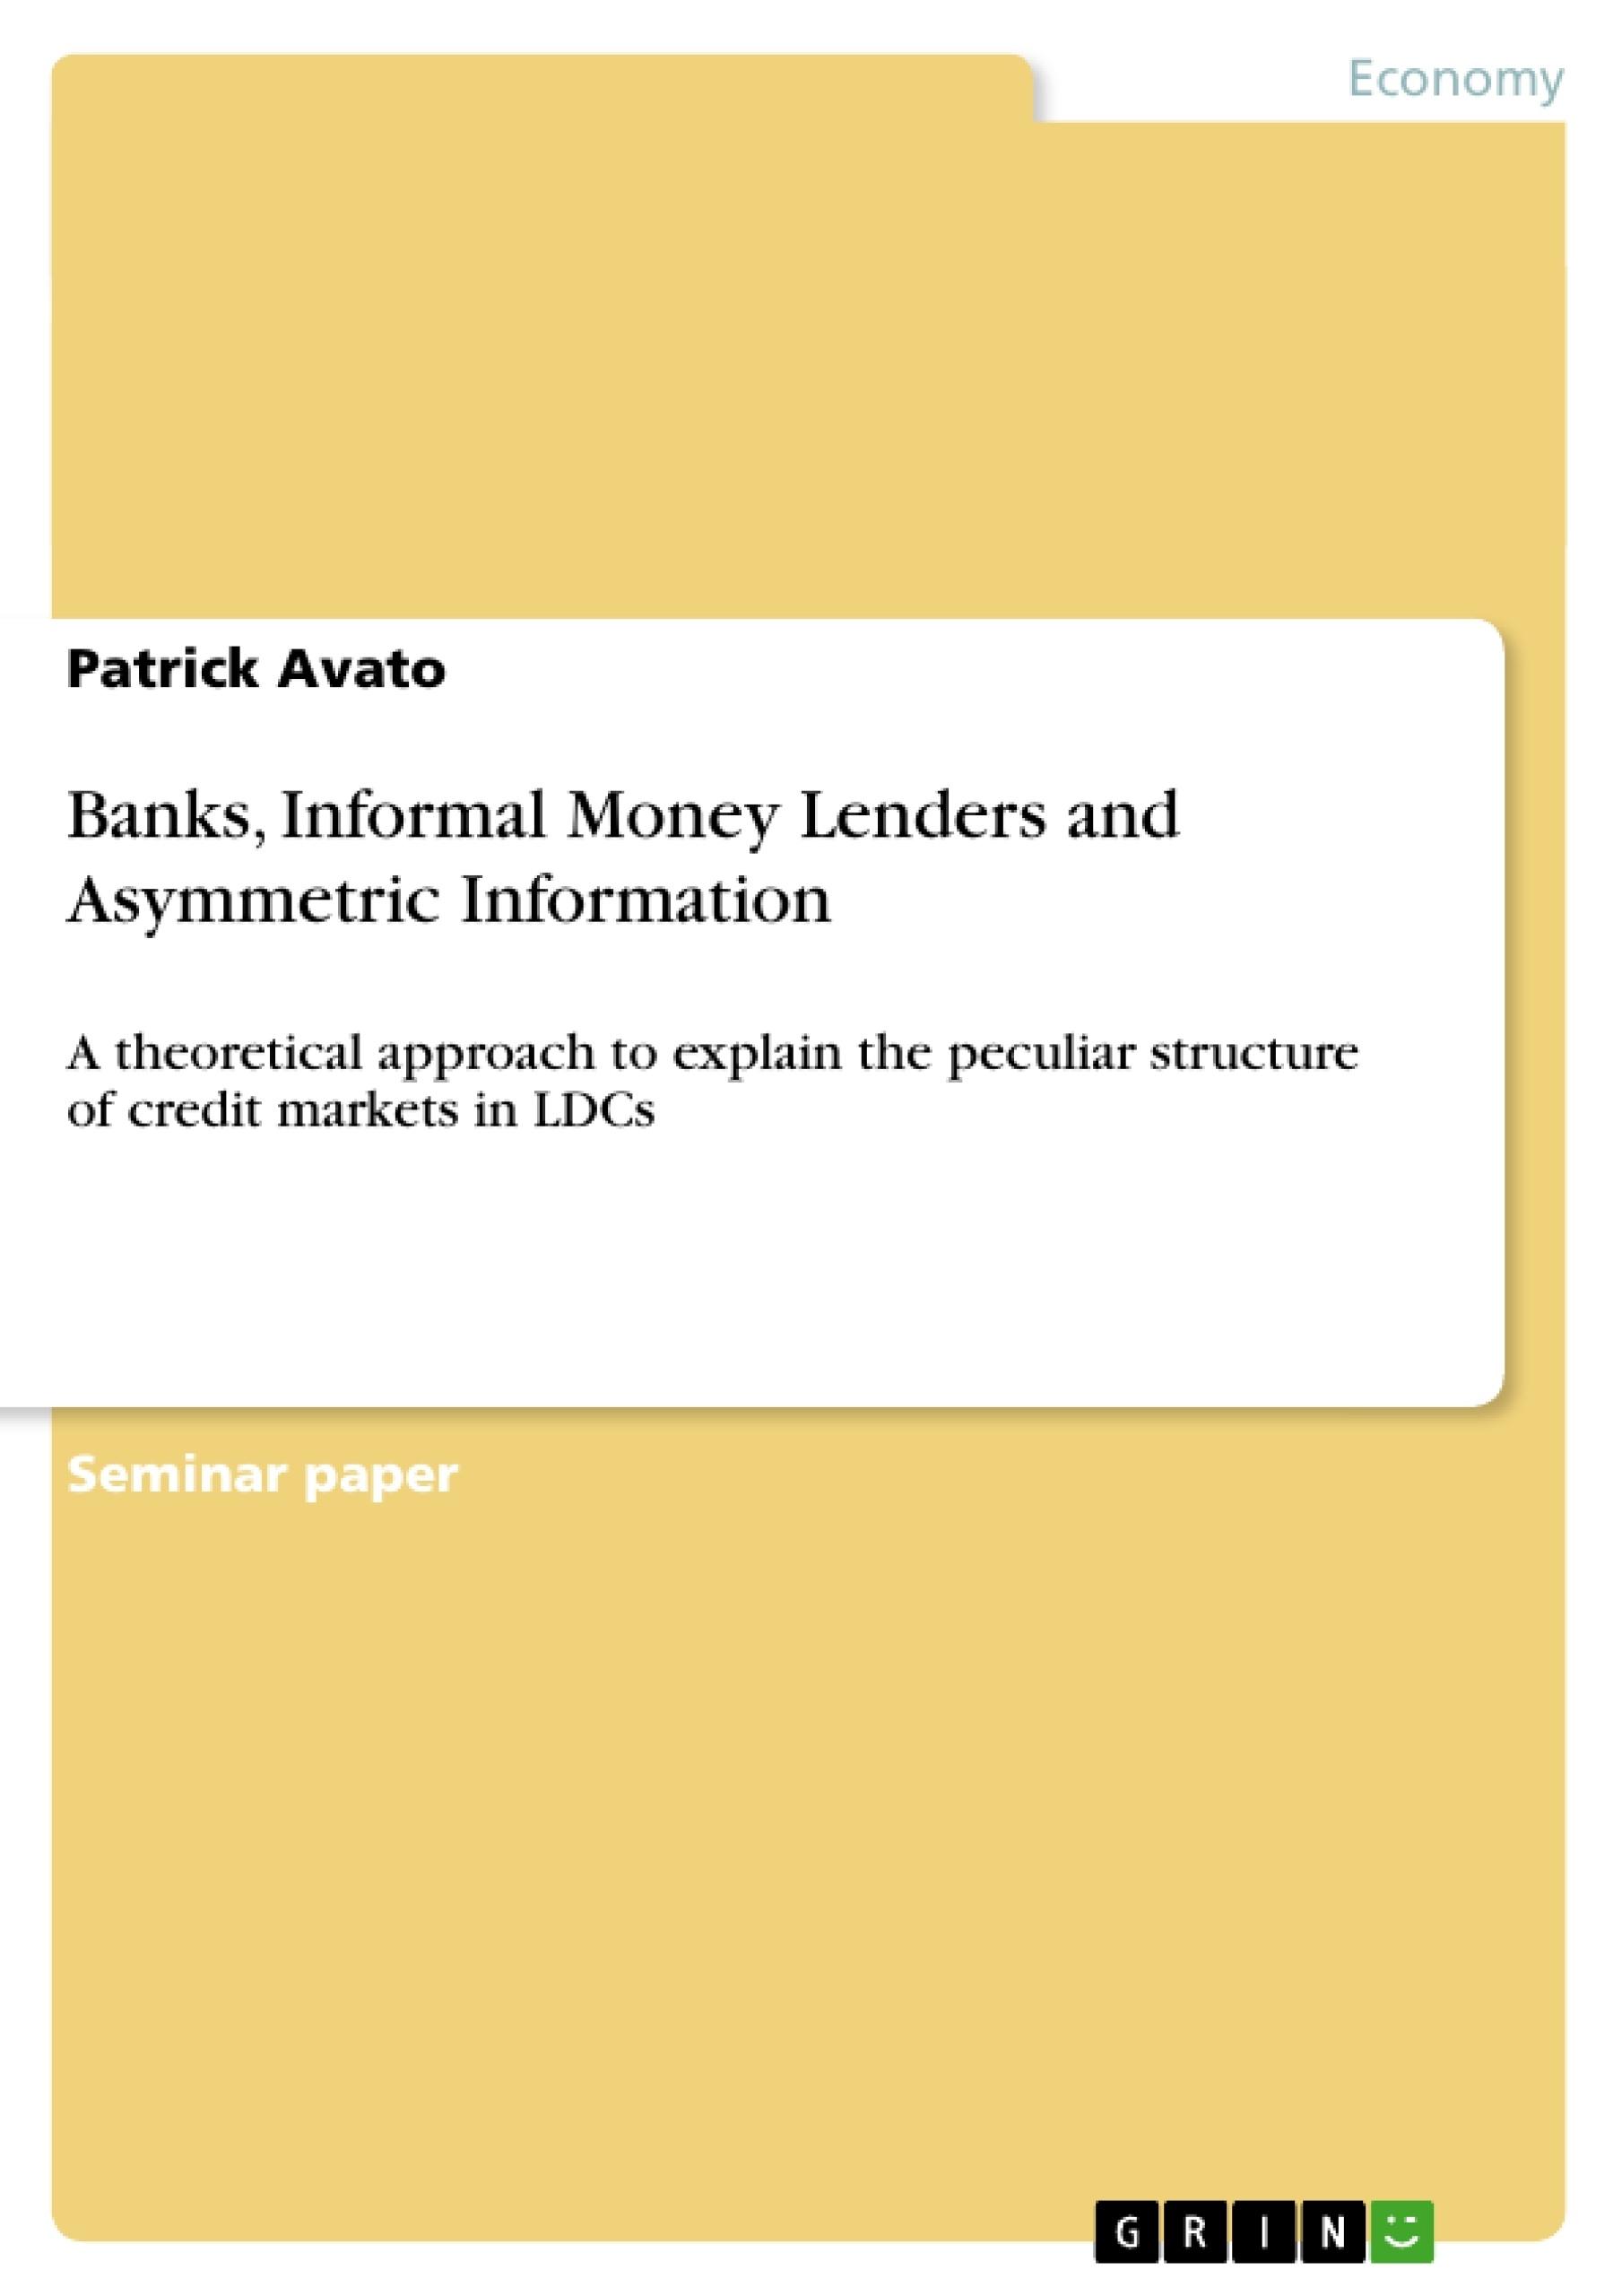 Title: Banks, Informal Money Lenders and Asymmetric Information